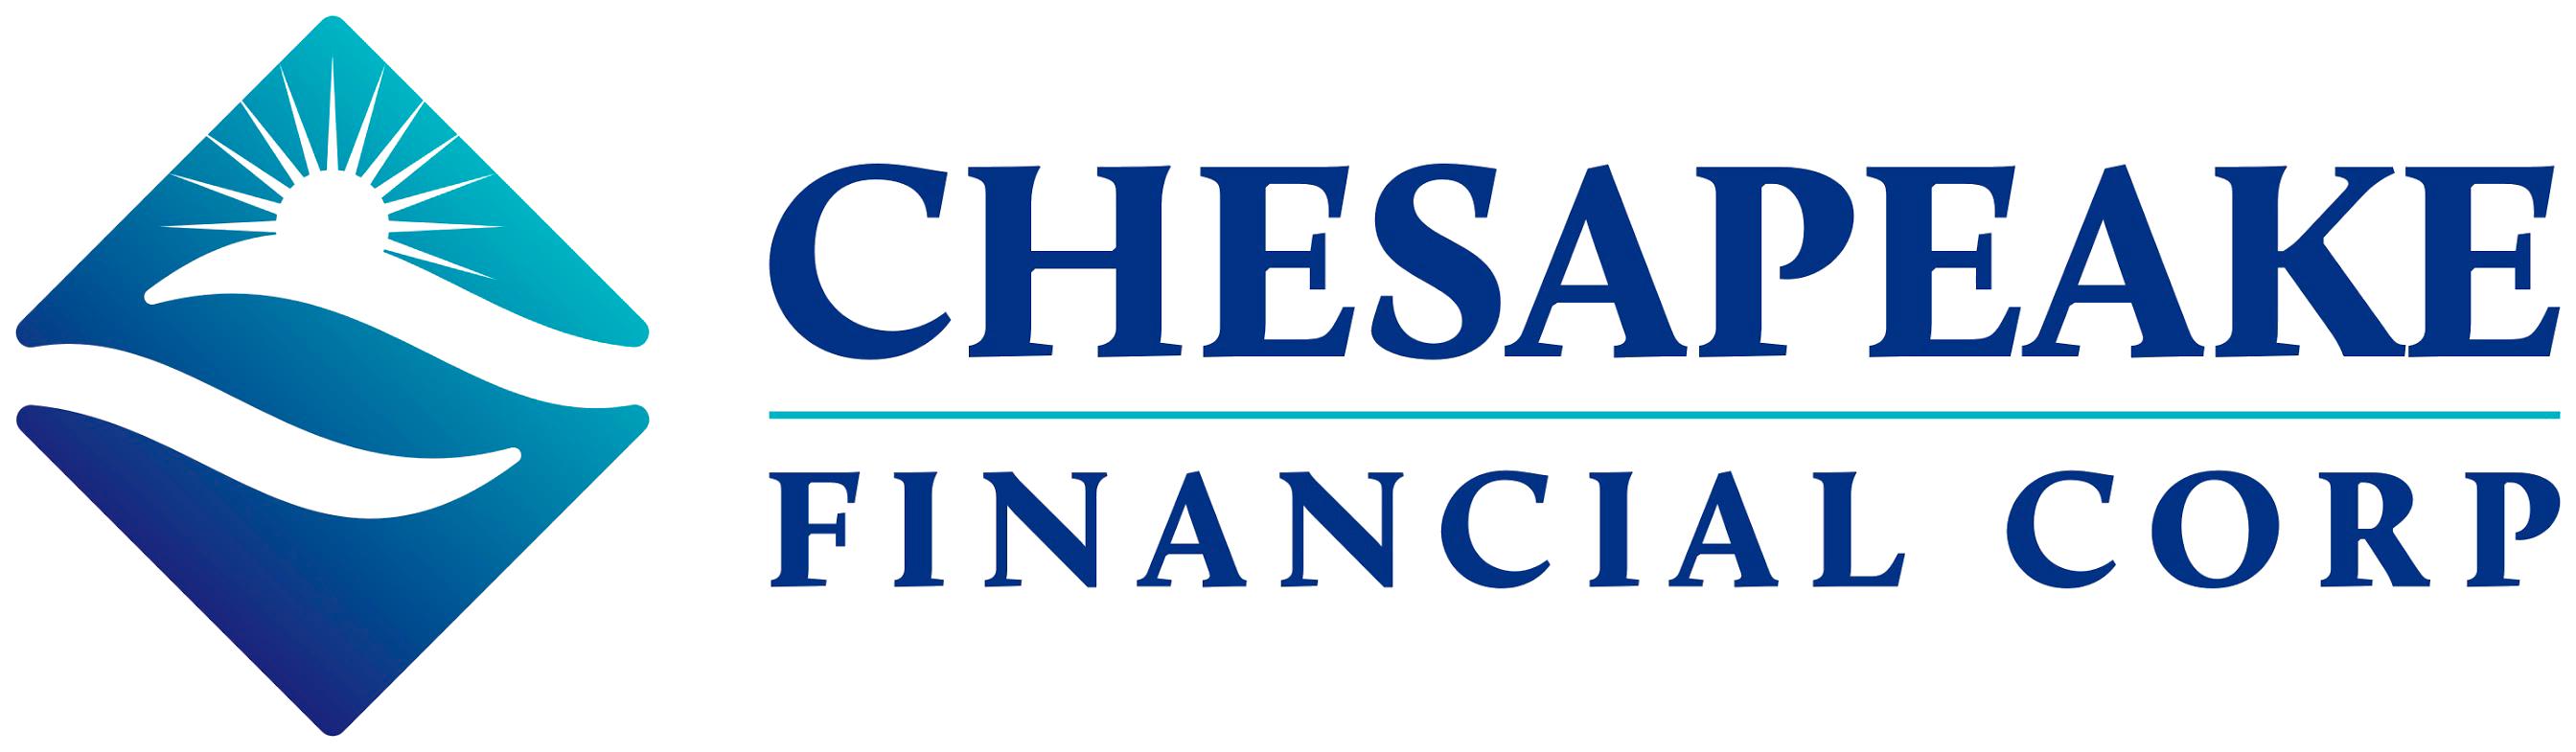 Chesapeake Financial Corp.